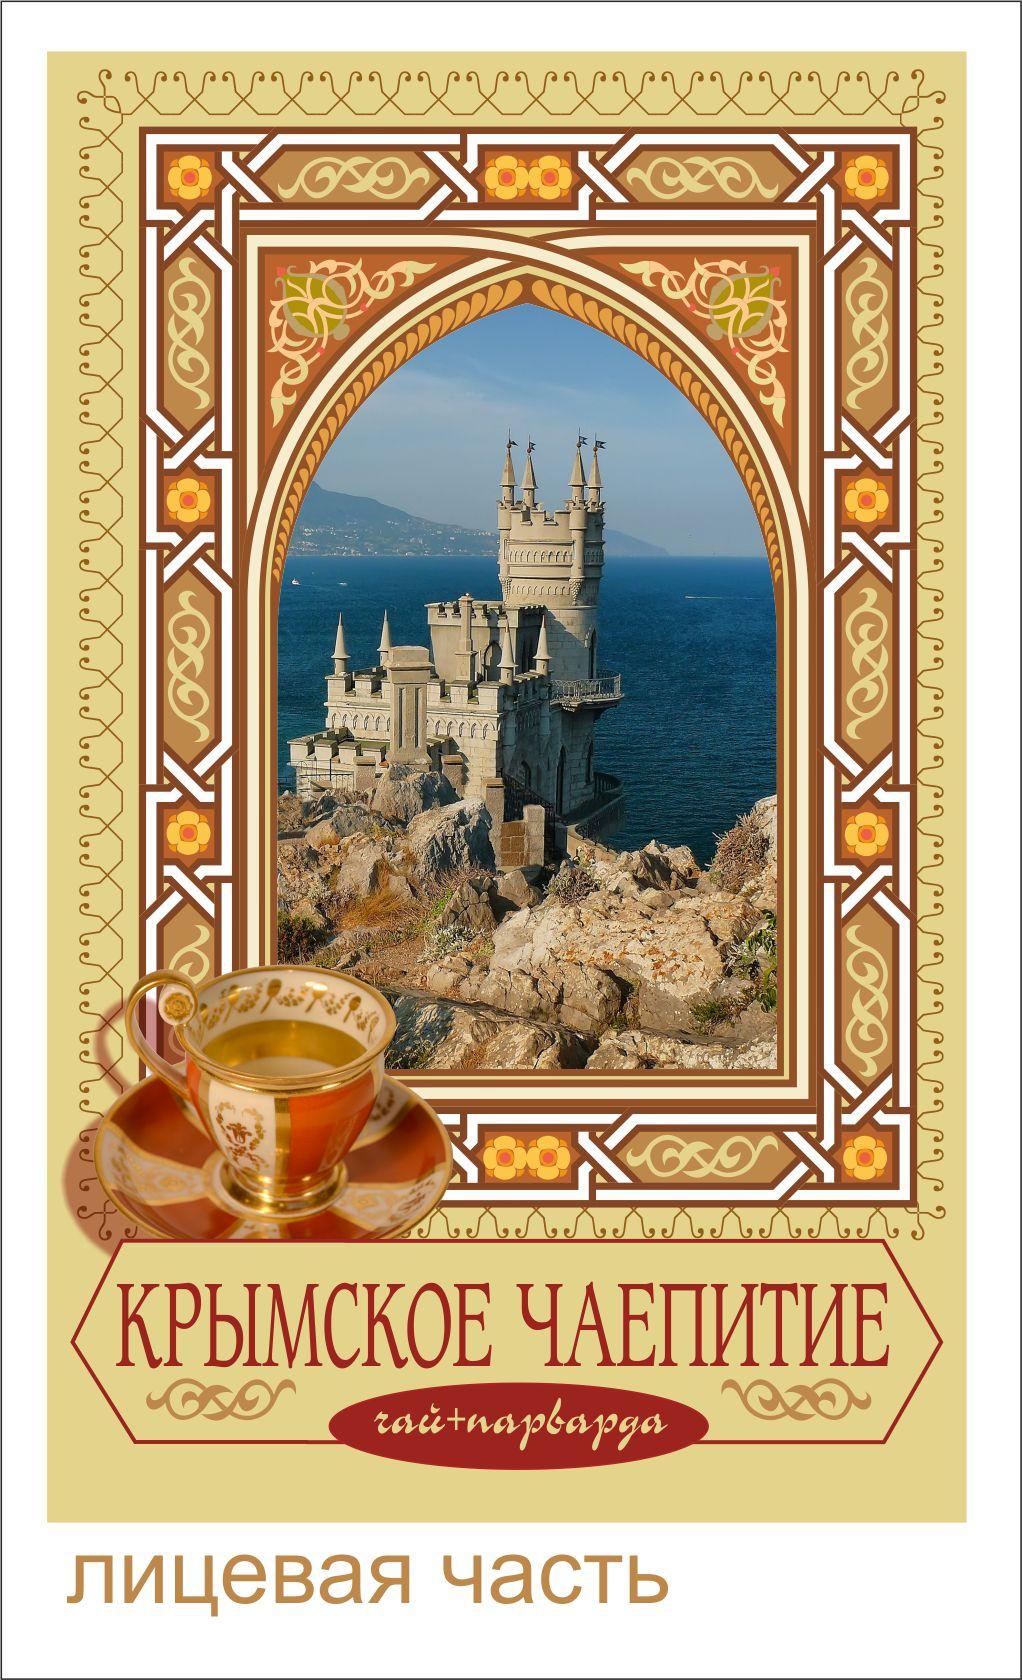 Дизайн коробки сувенирной  чай+парварда (подарочный набор) фото f_6365a4e1144dd6e6.jpg